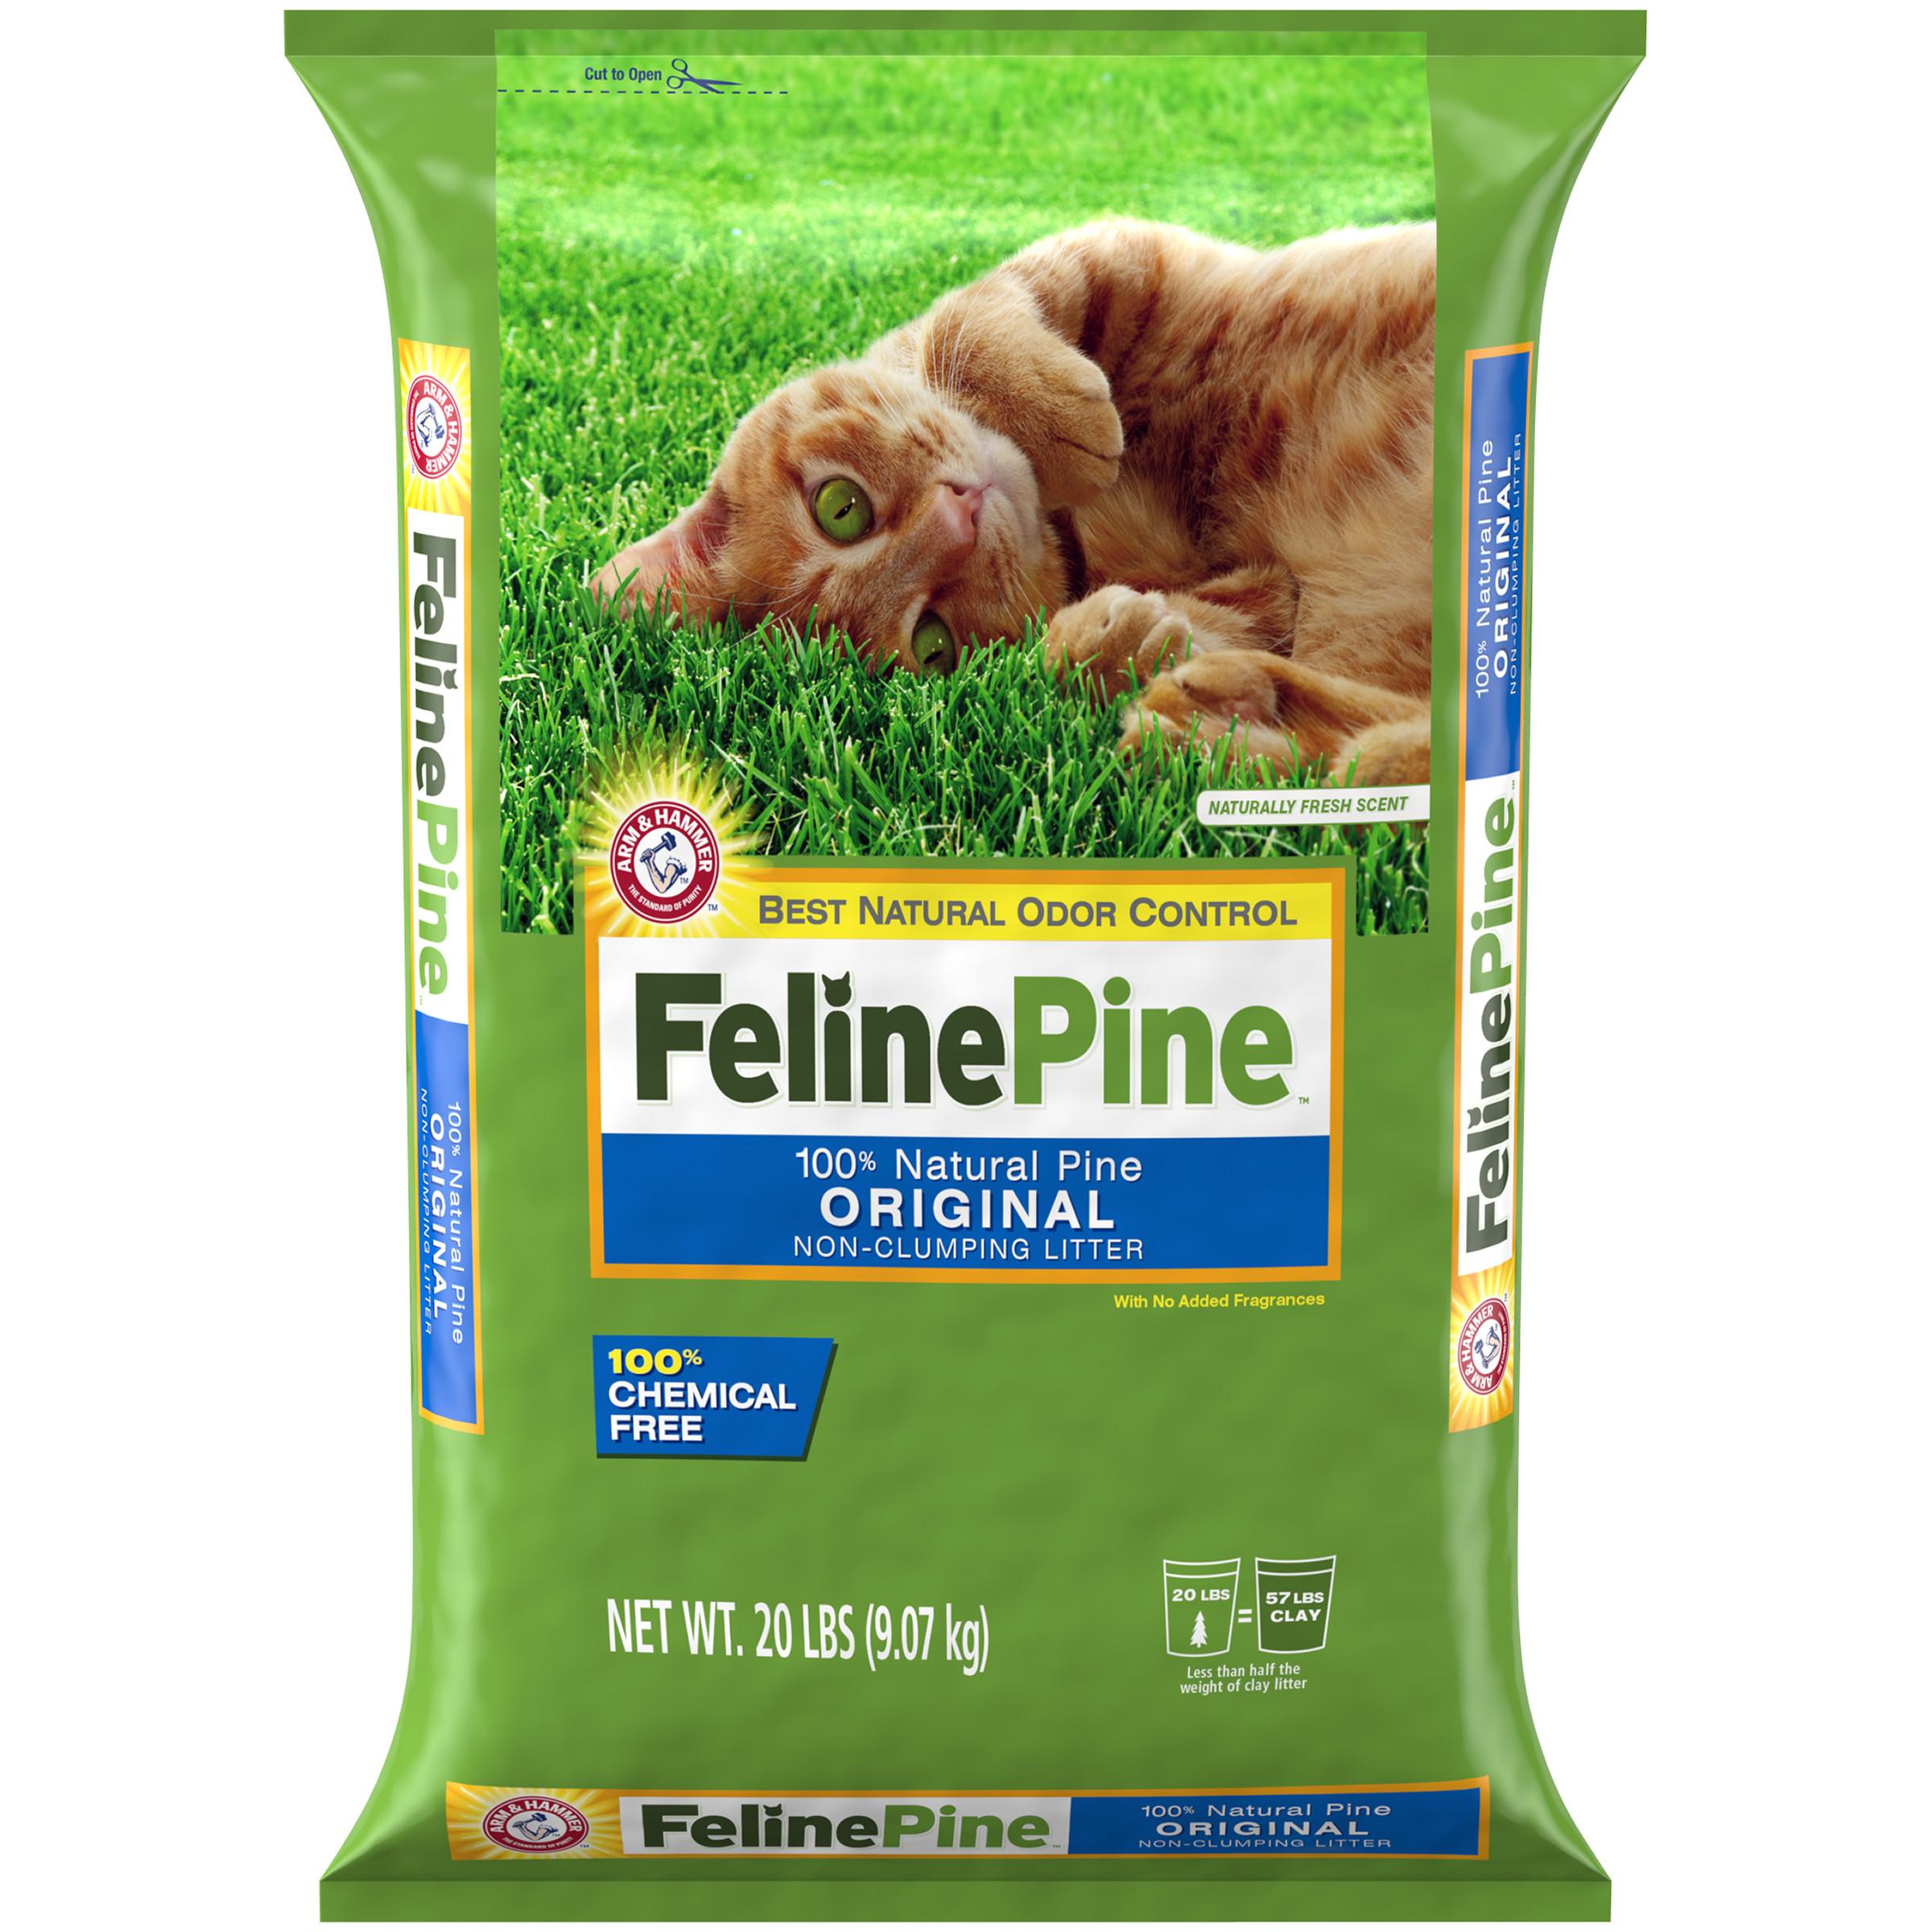 Feline Pine Original Cat Litter, 20 Lb.